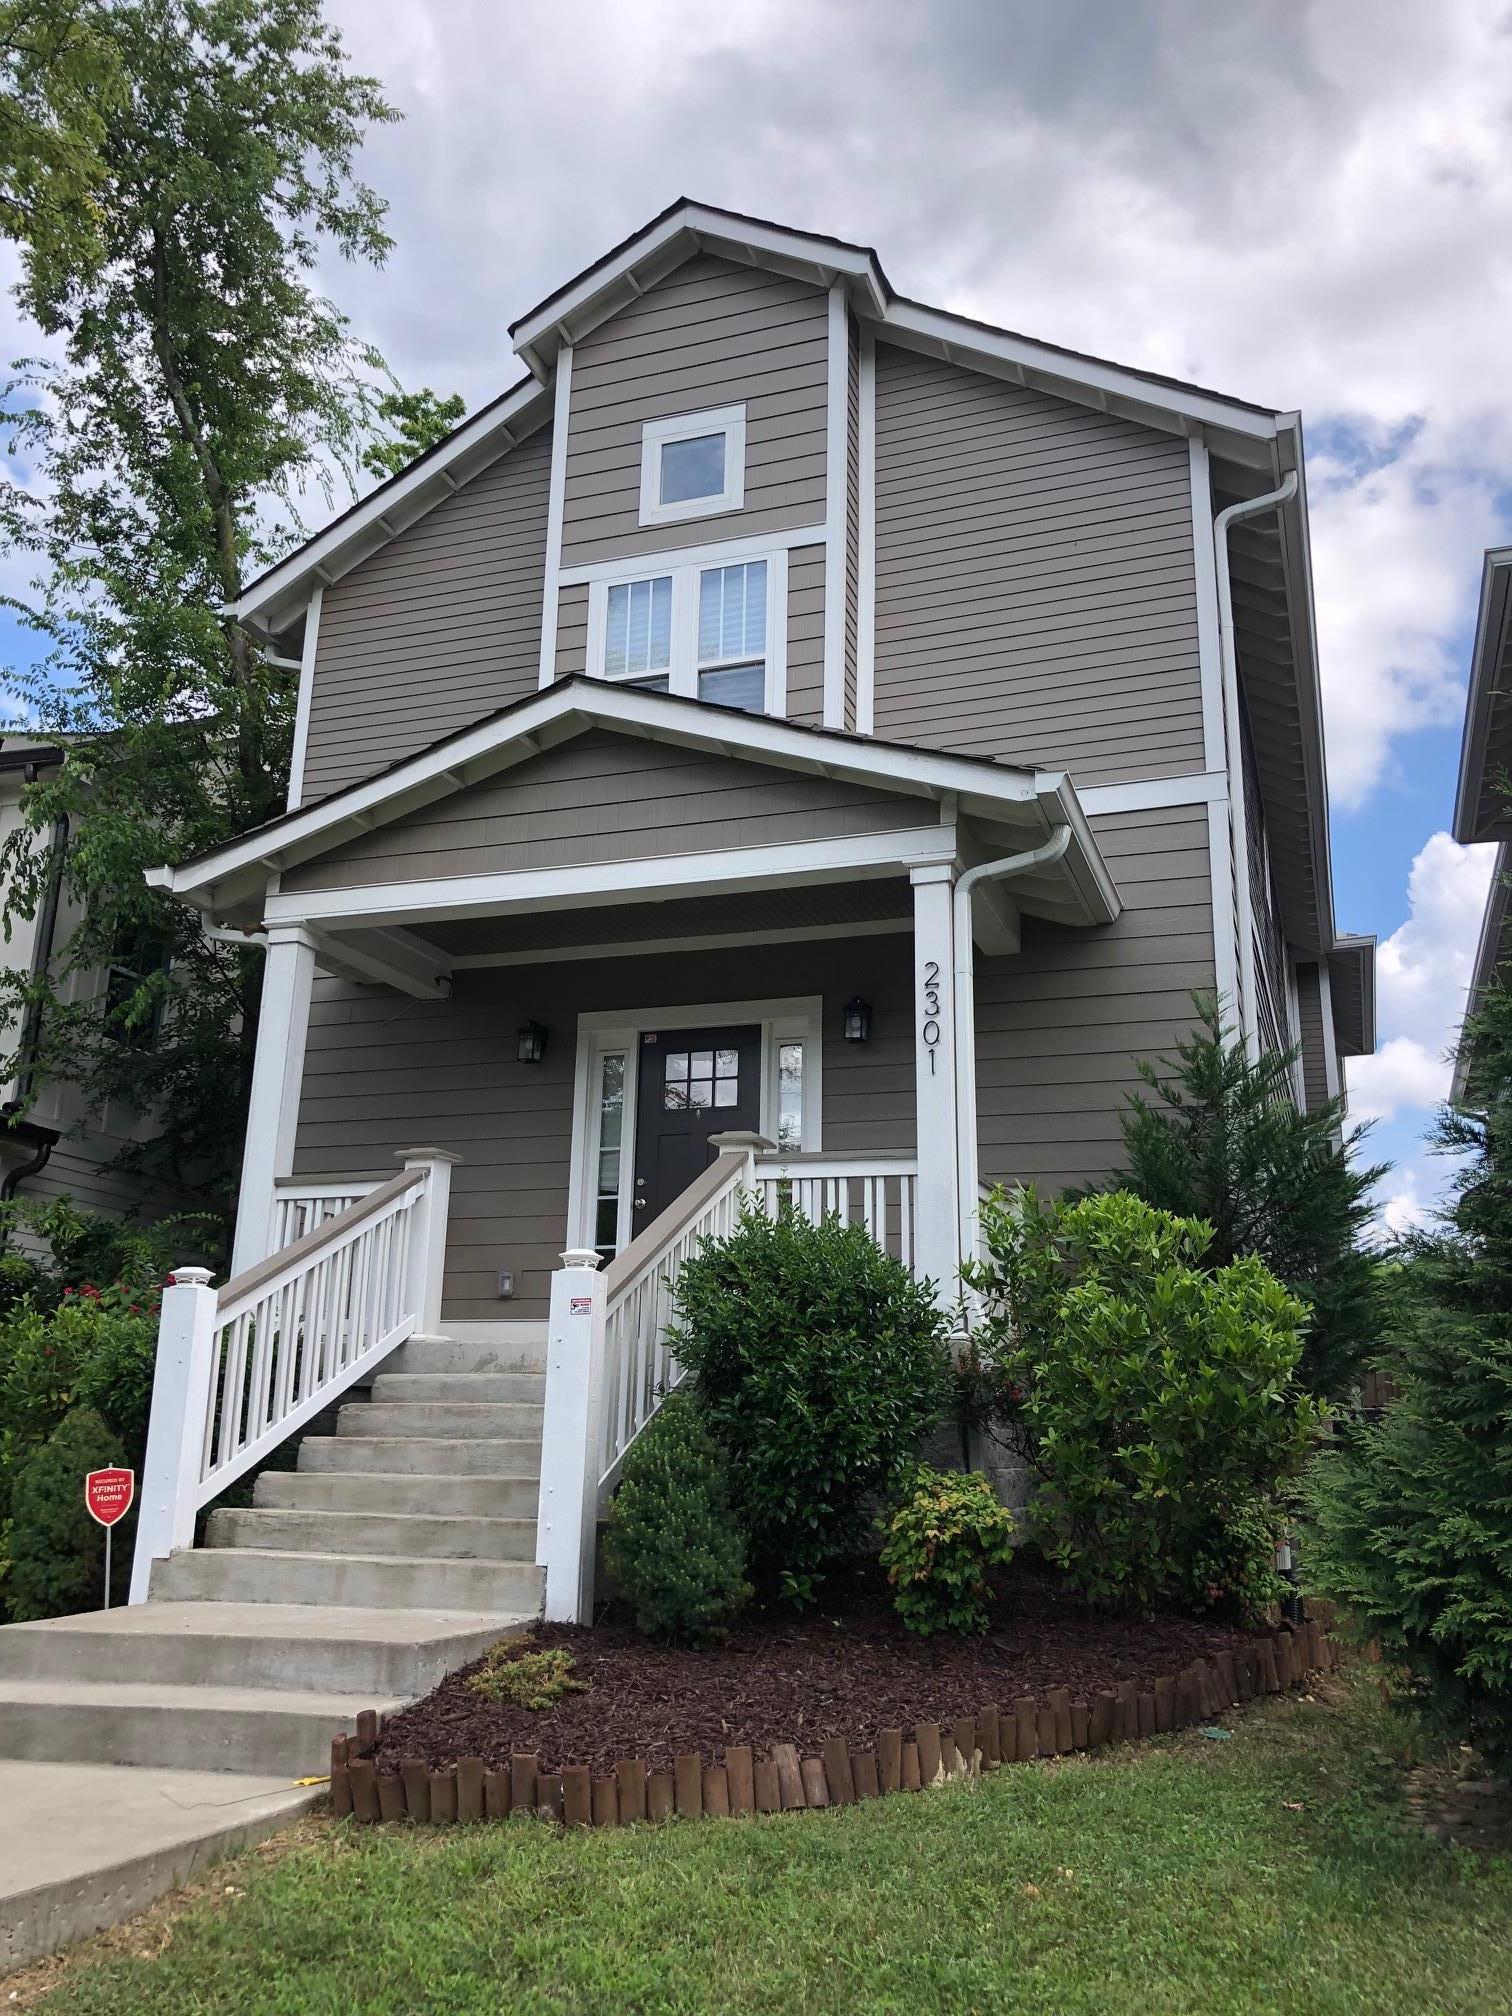 2301 Scott Ave, Nashville, TN 37216 - Nashville, TN real estate listing